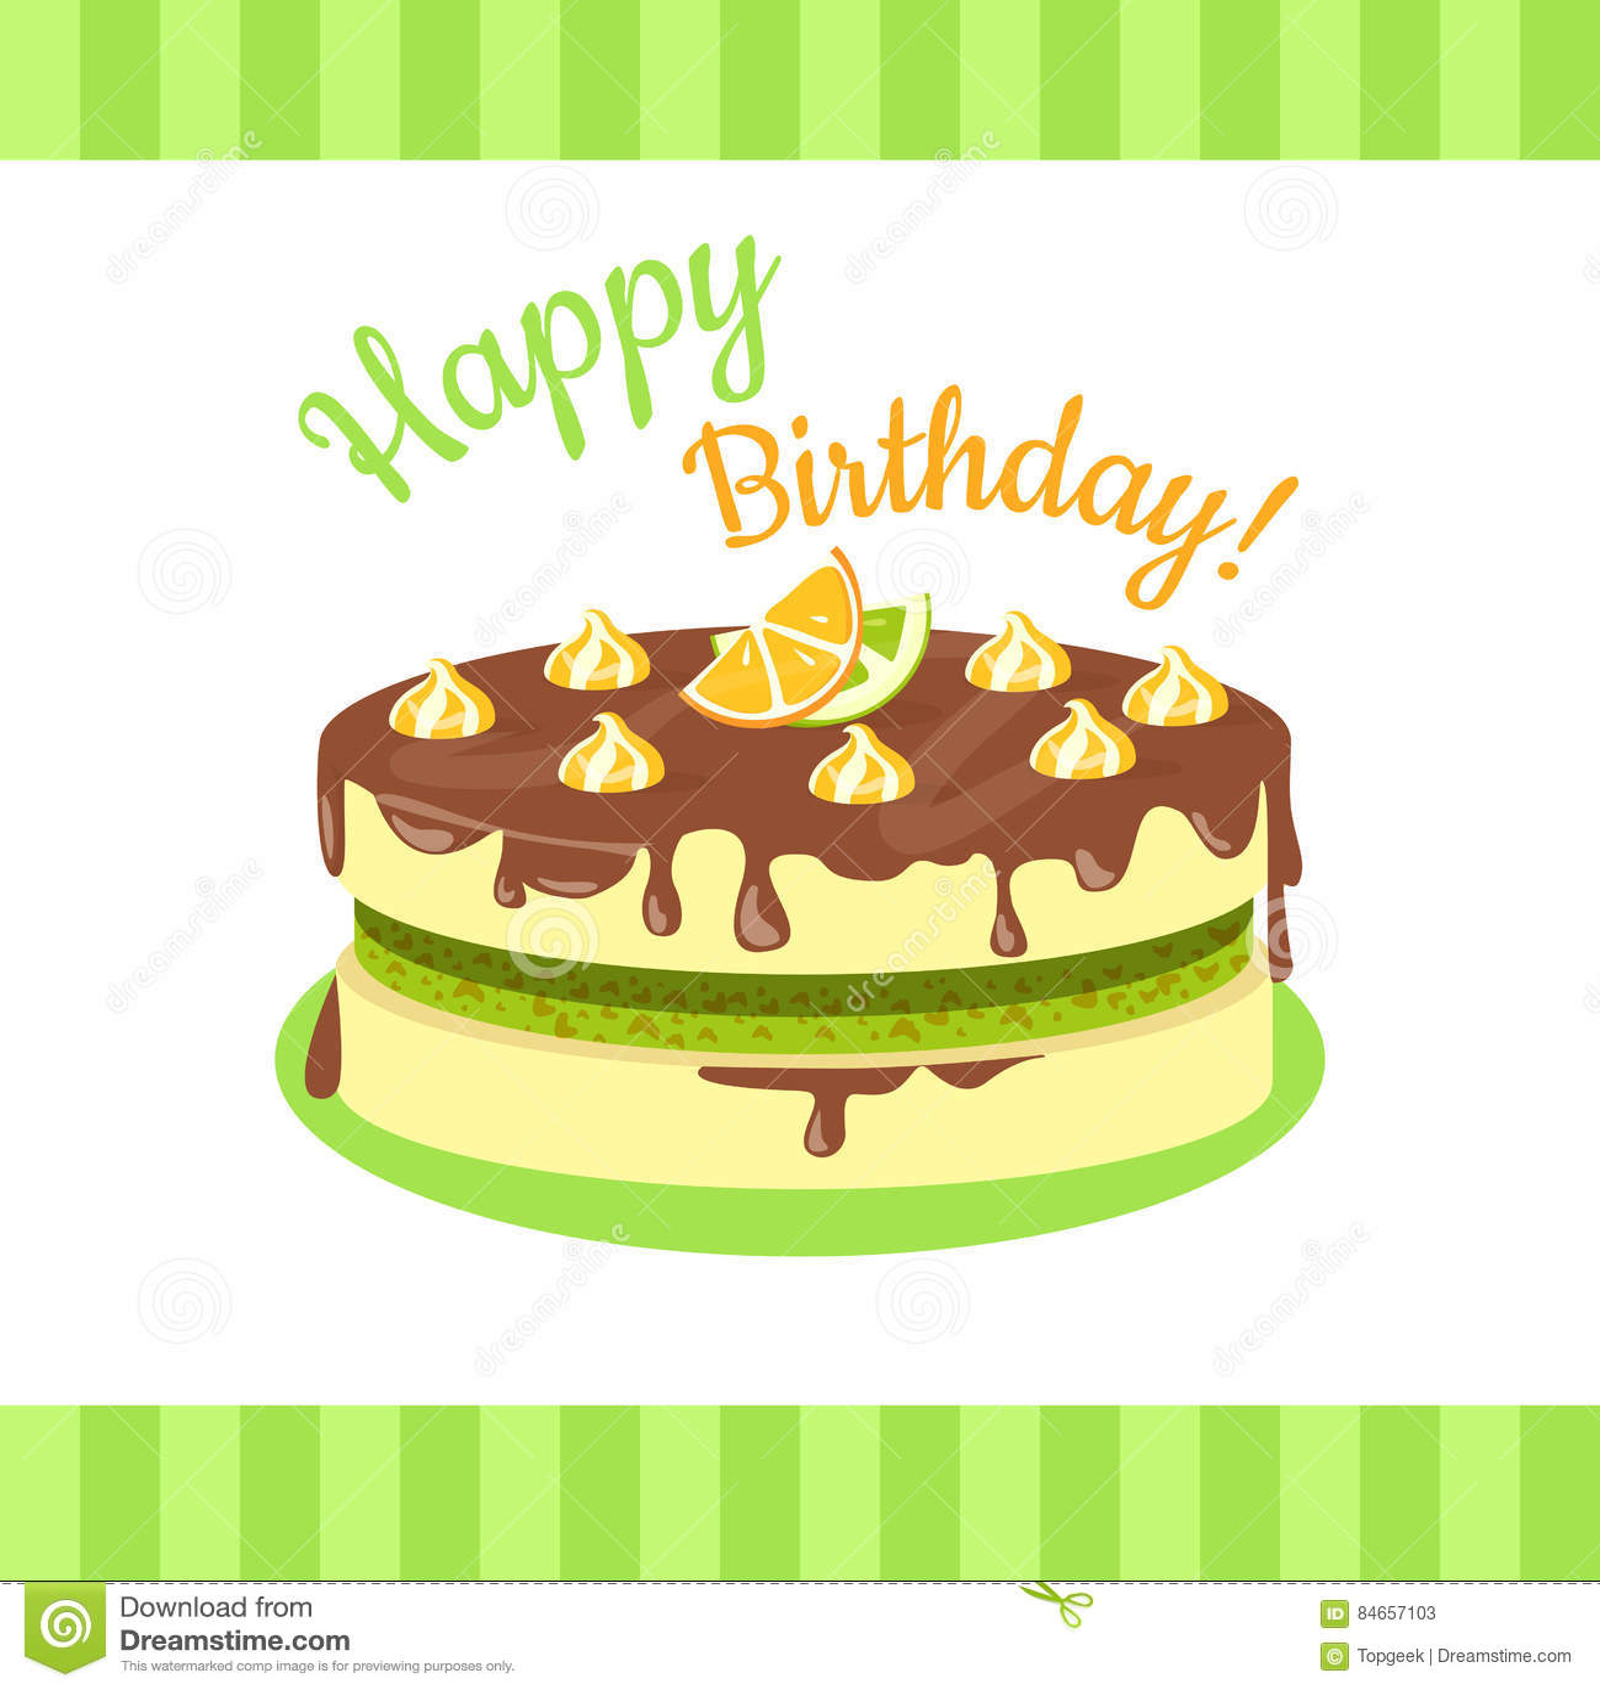 Happy Birthday Cake With Citrus Fruits Isolated